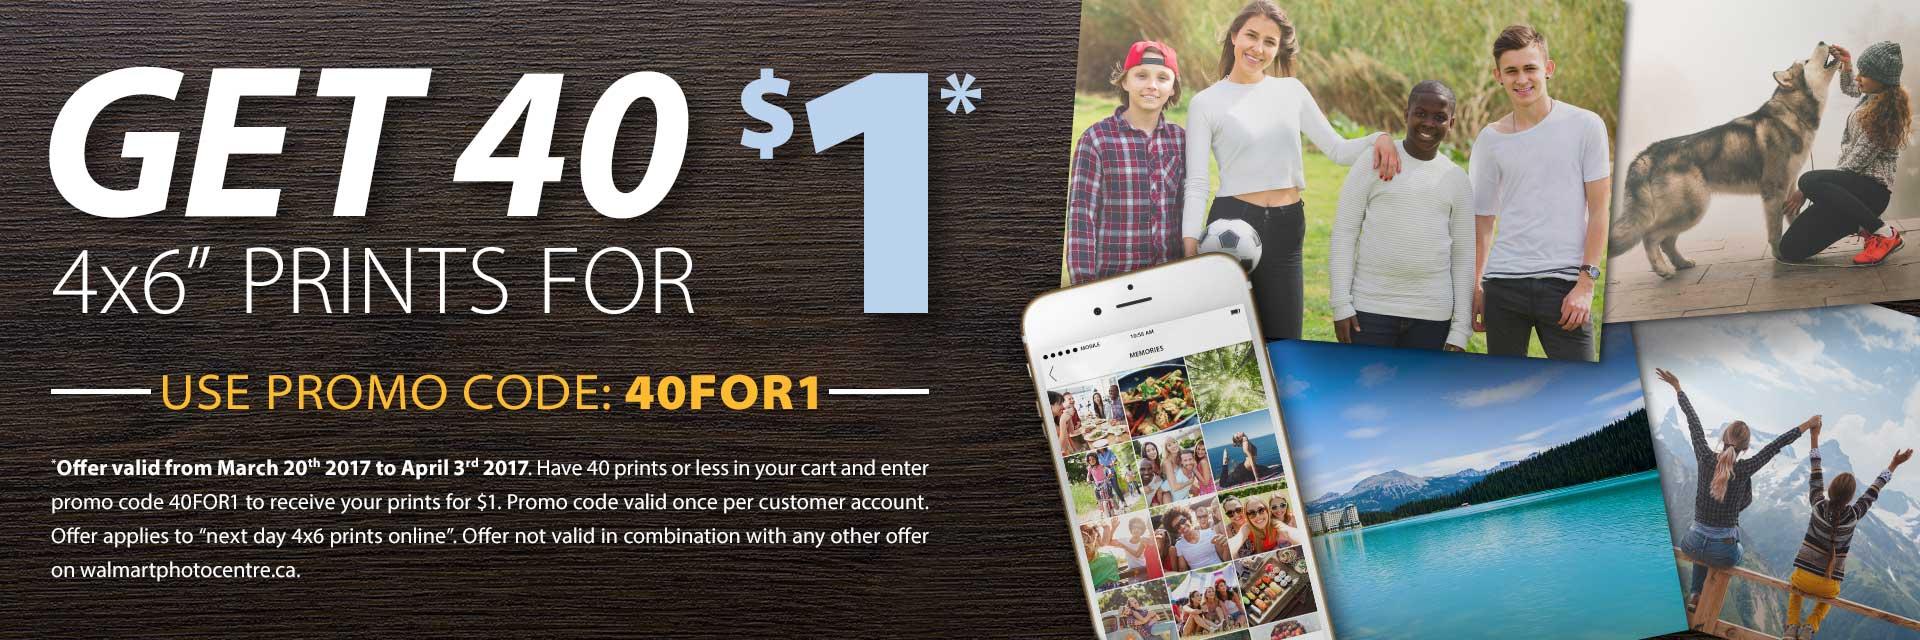 walmart photo centre 40 prints for 1 dollar